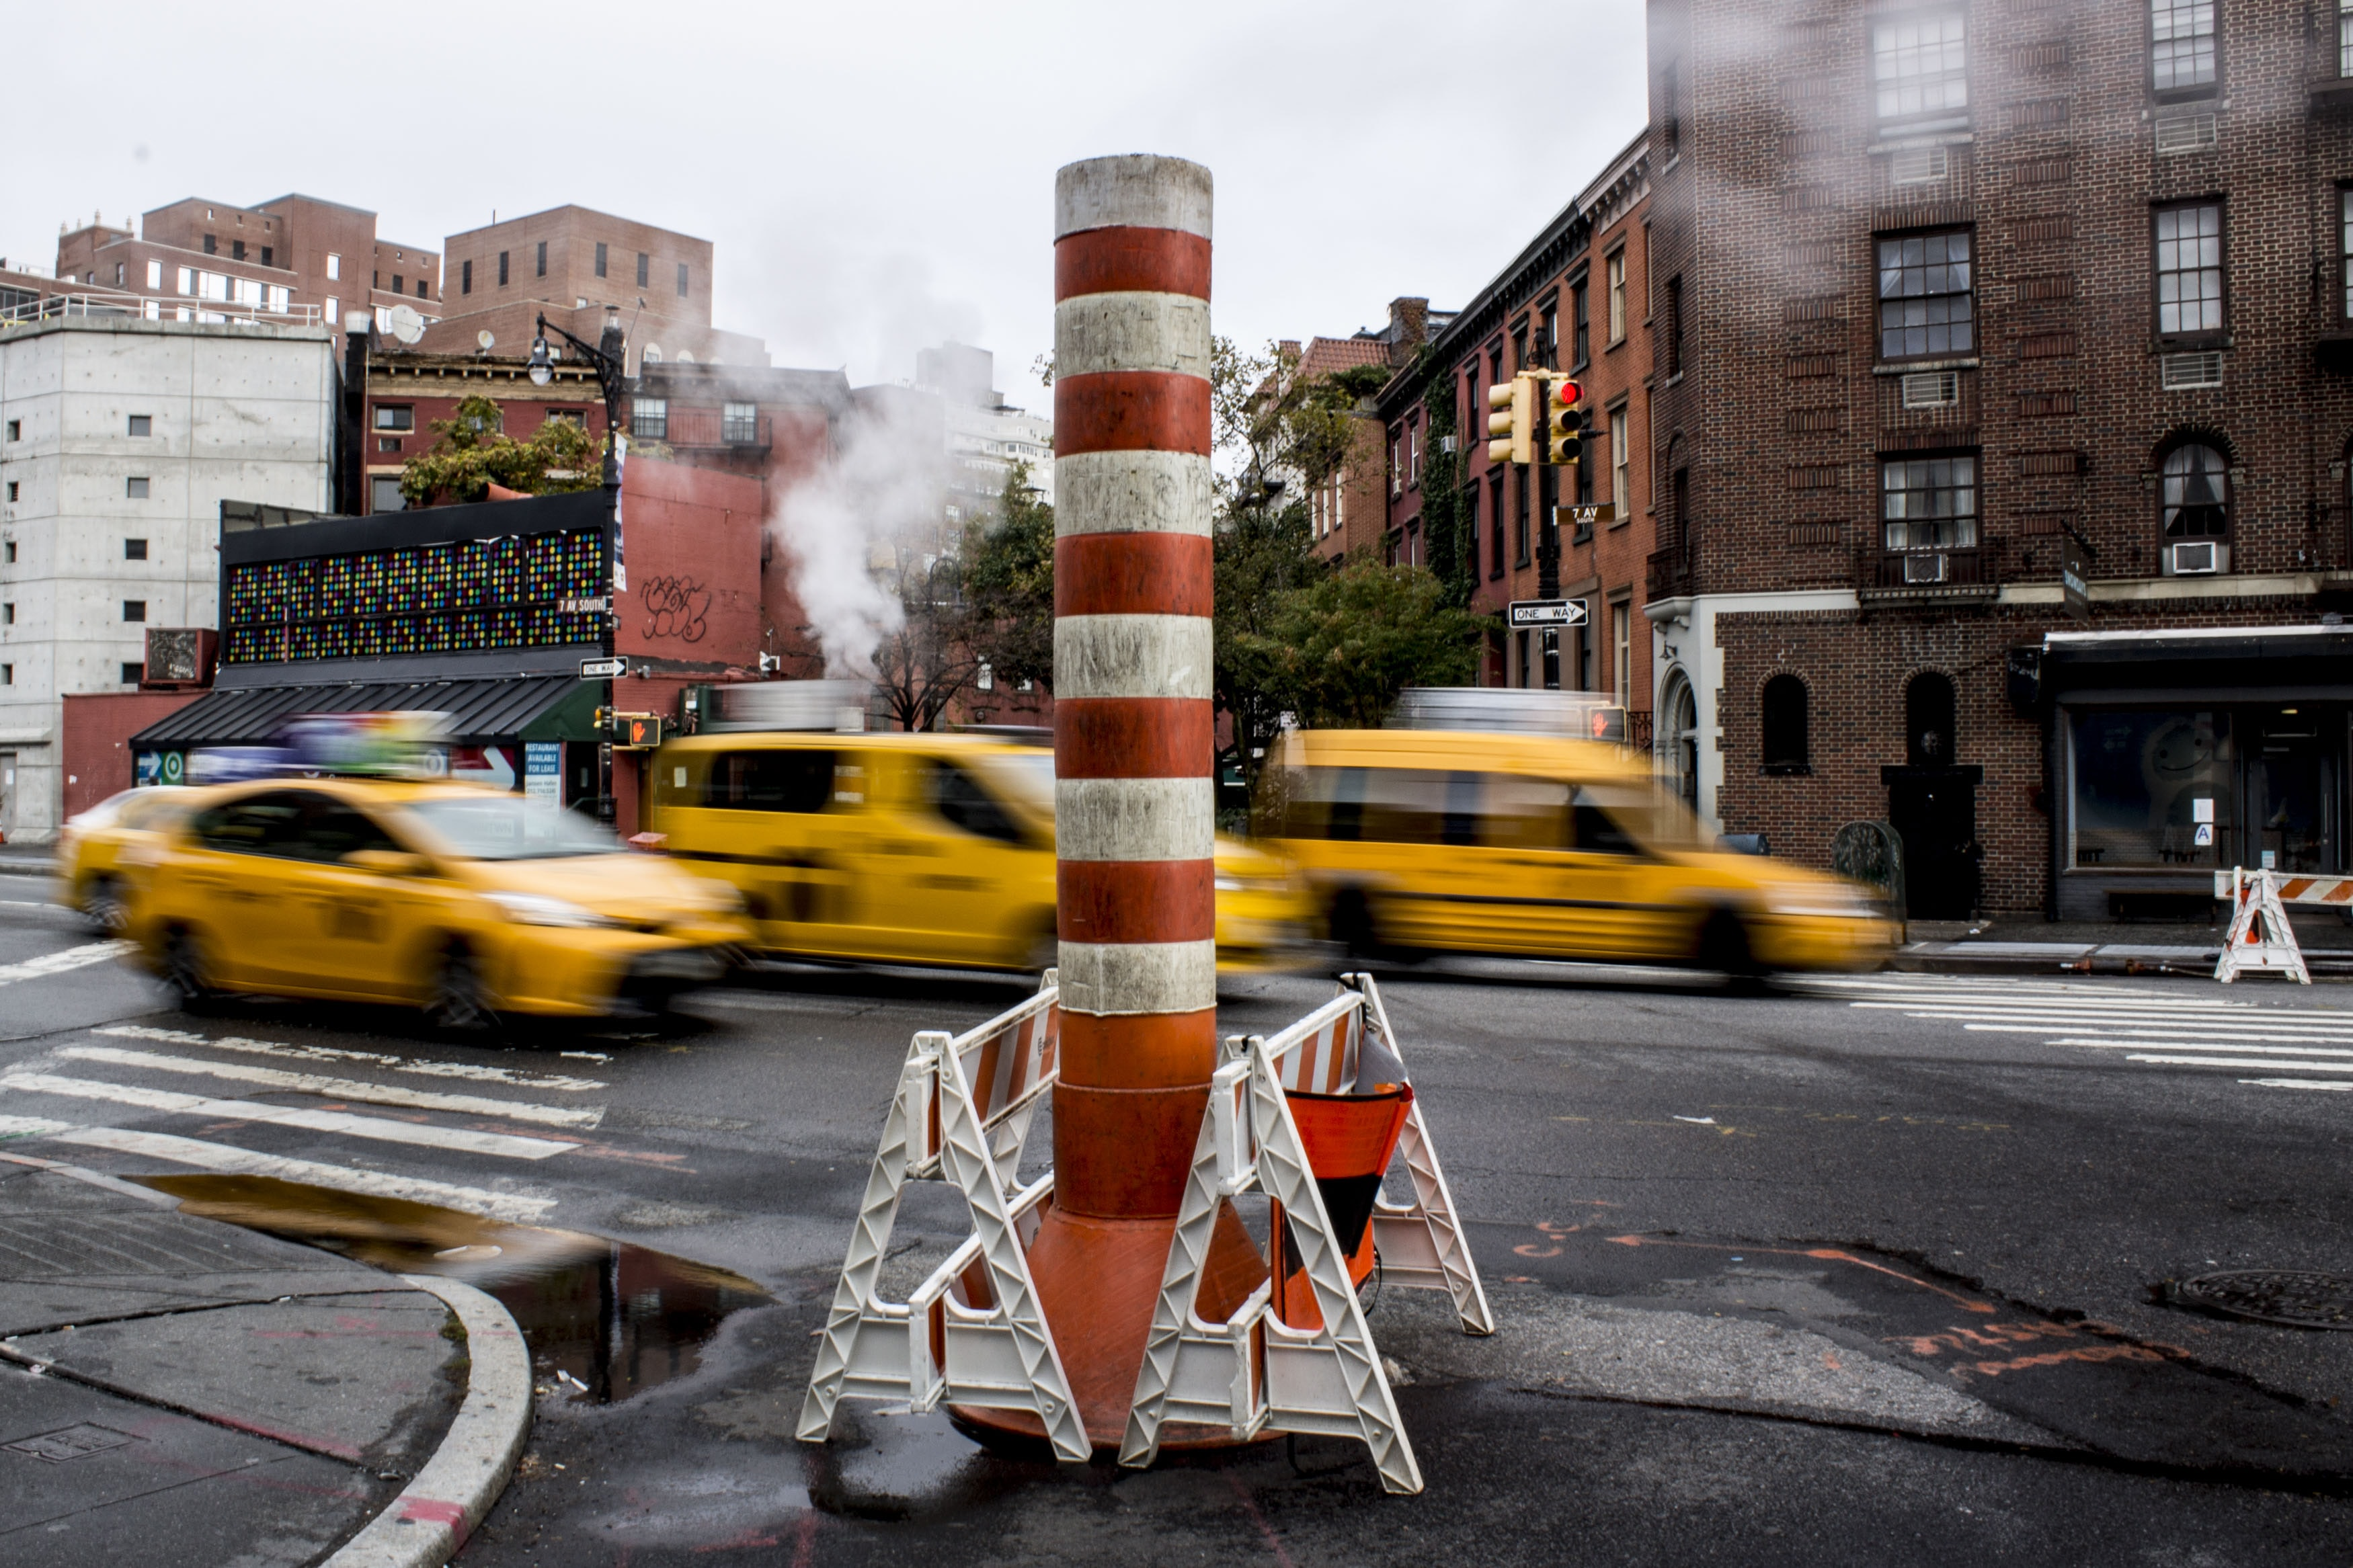 orange and white striped pole near vehicles timelapse photography